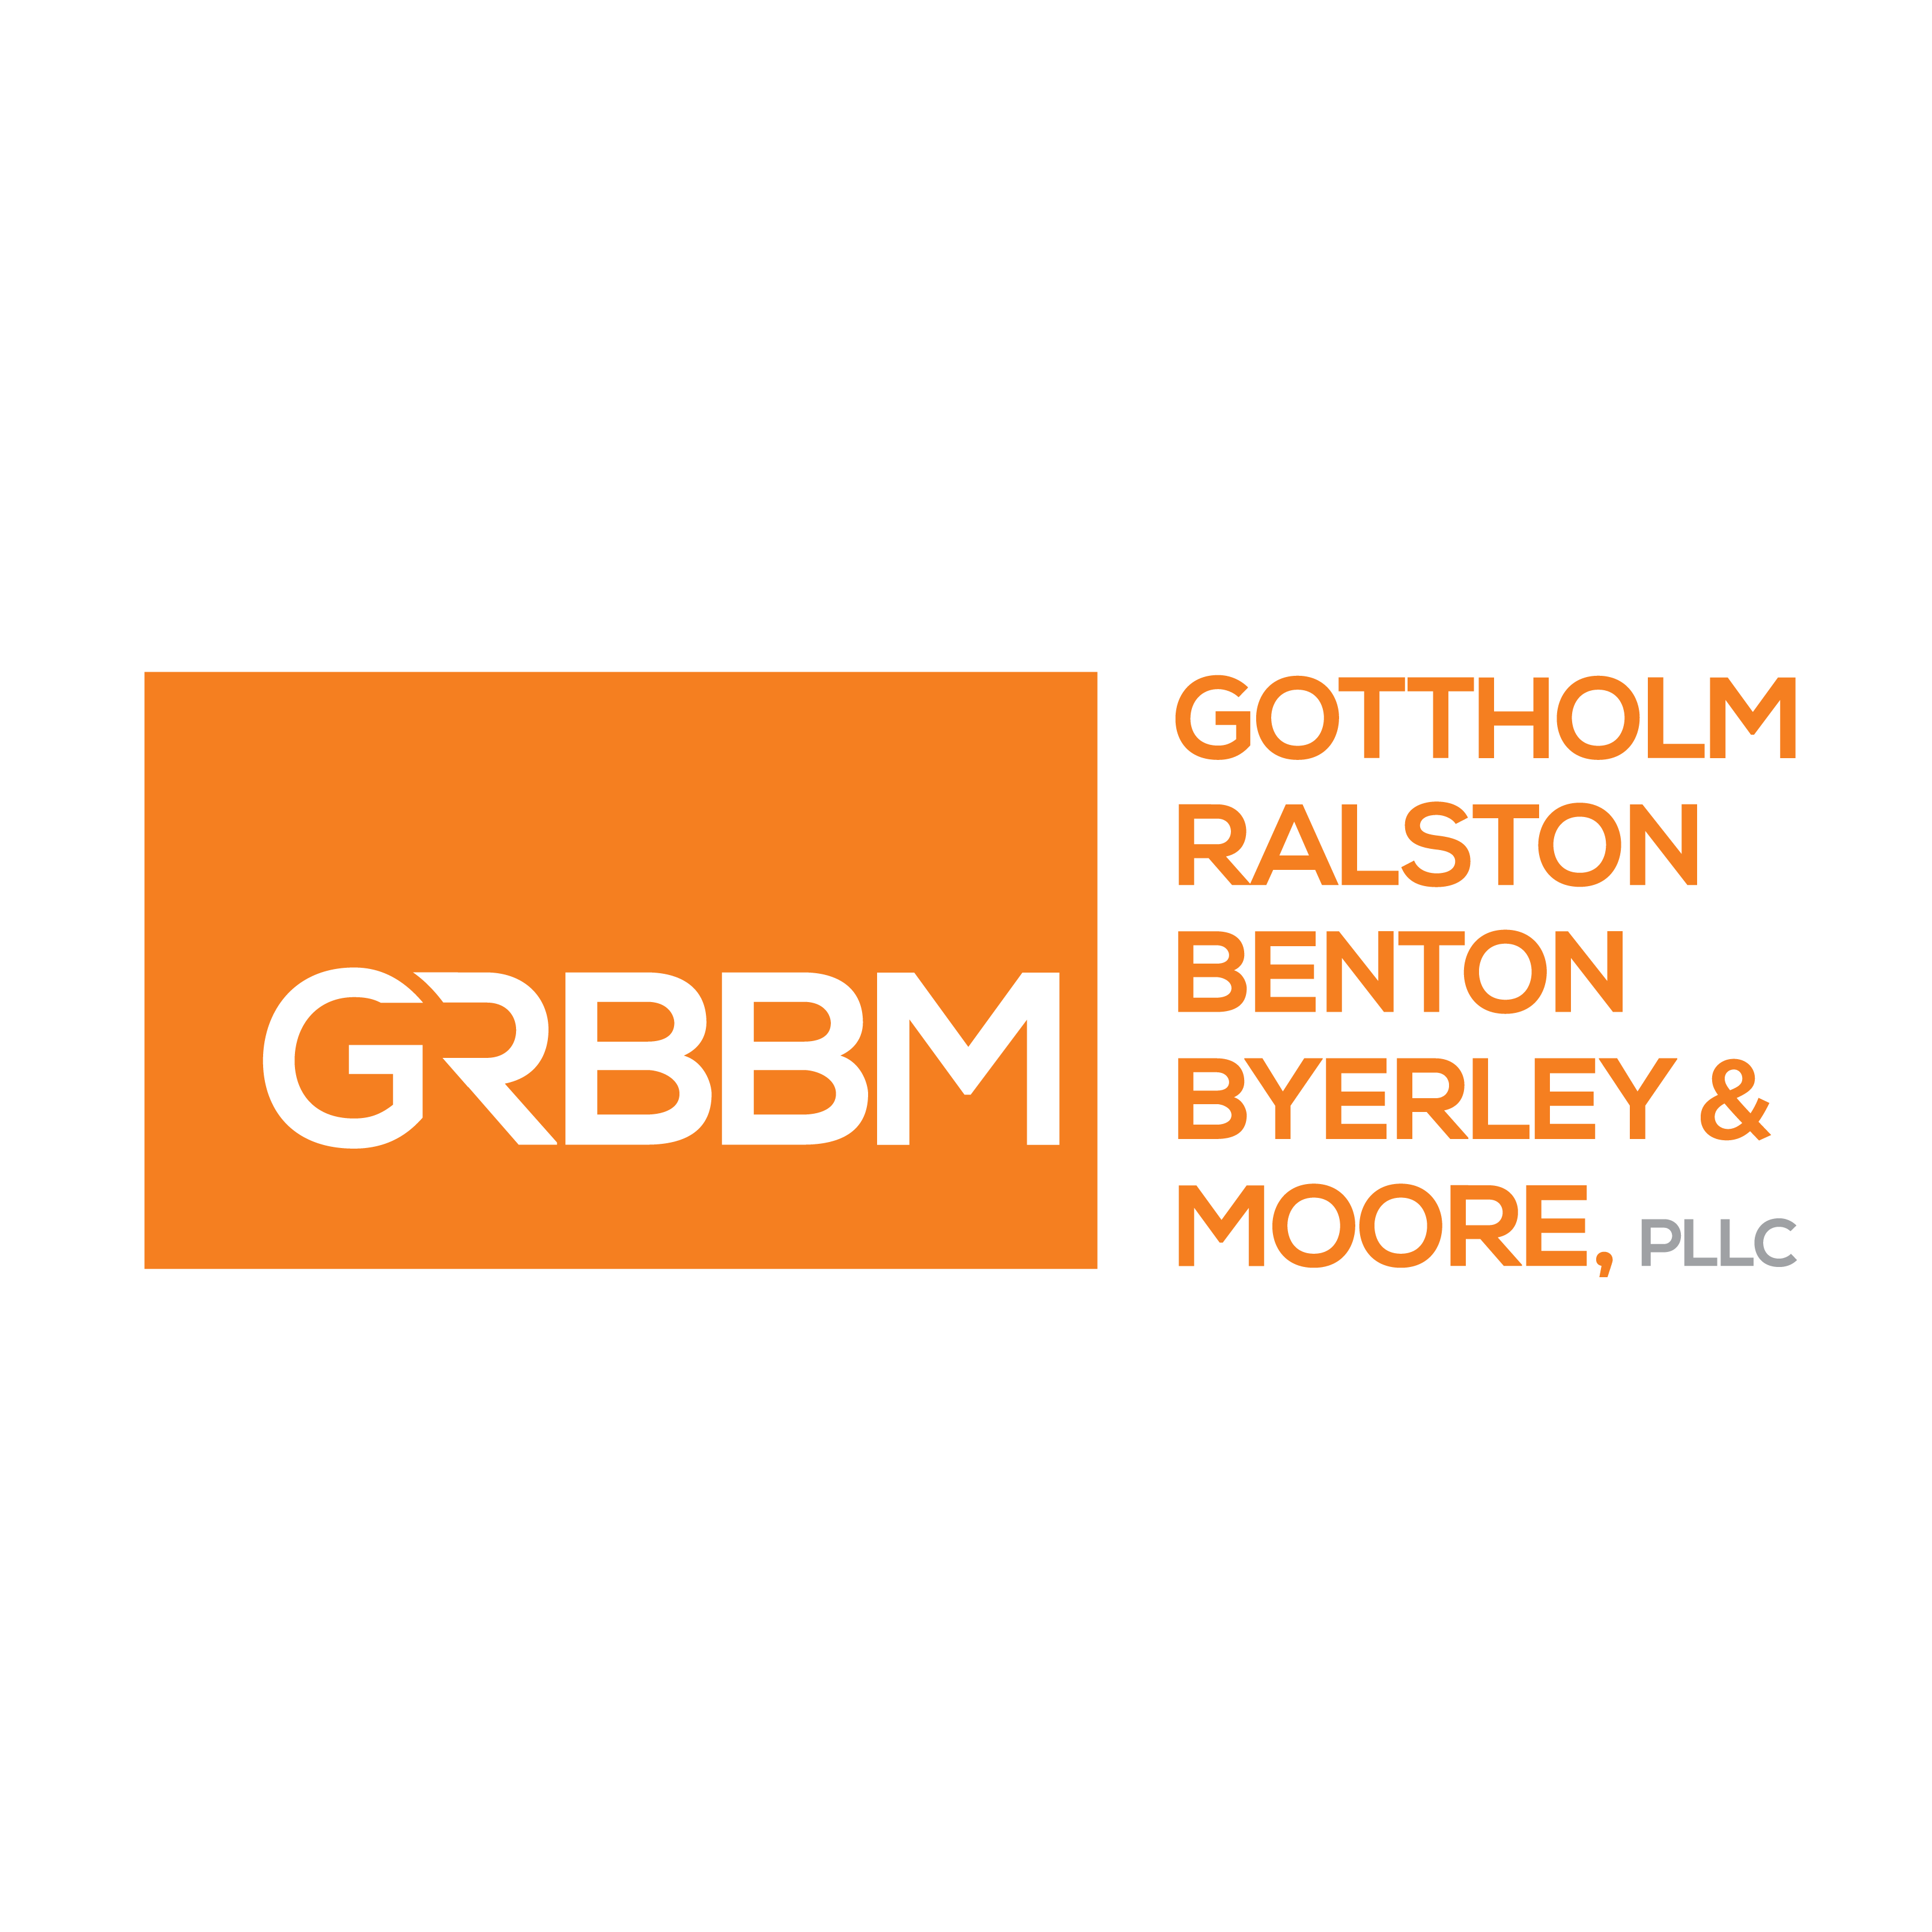 Gottholm, Ralston, Benton, Byerley & Moore, PLLC image 0